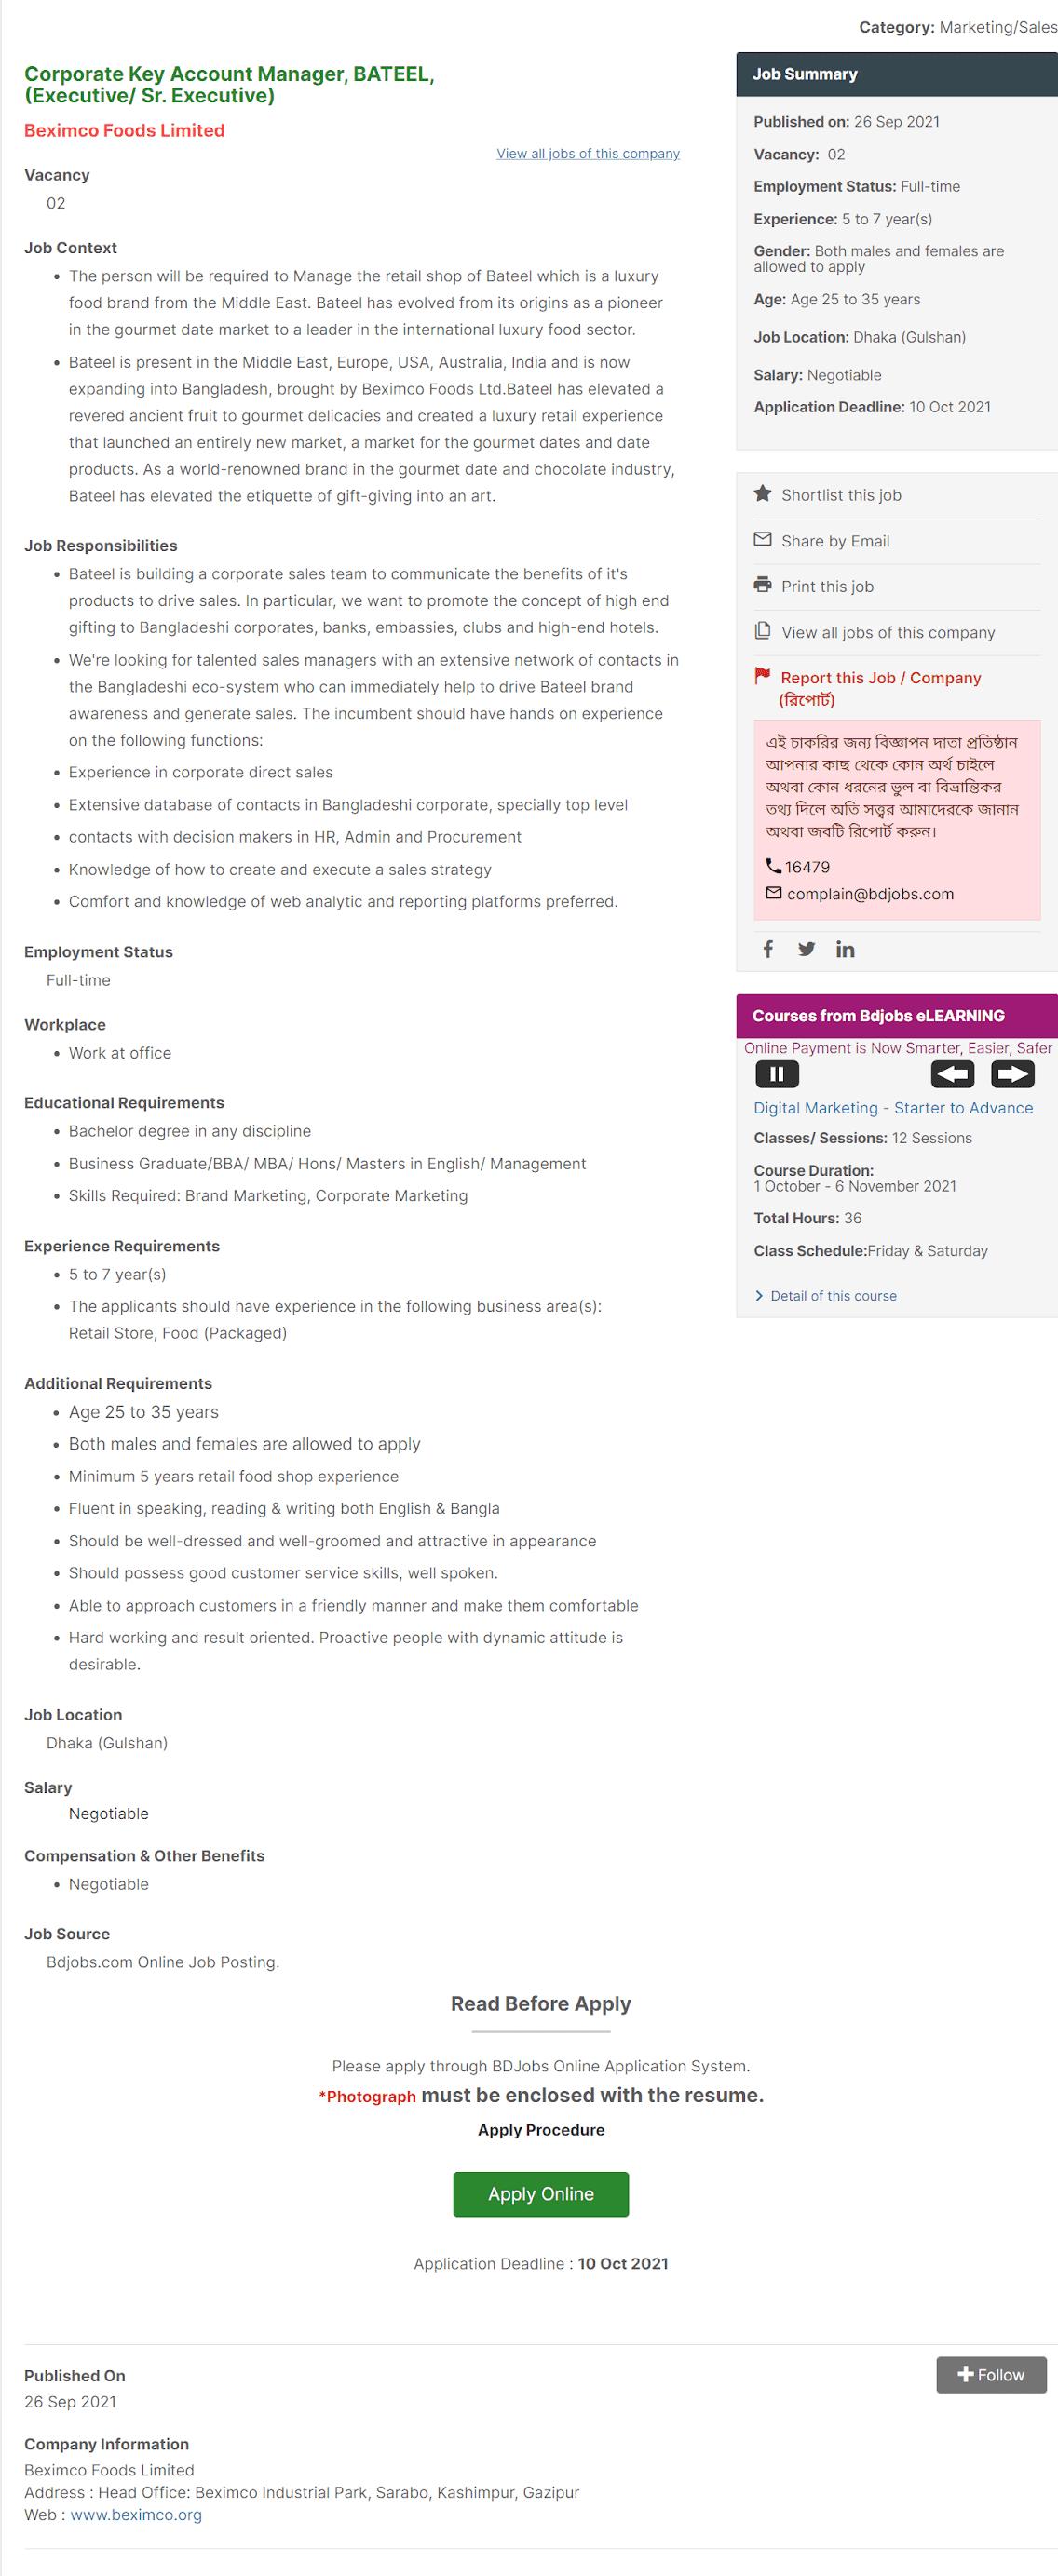 Beximco Pharmaceuticals Limited Job Circular image 2021